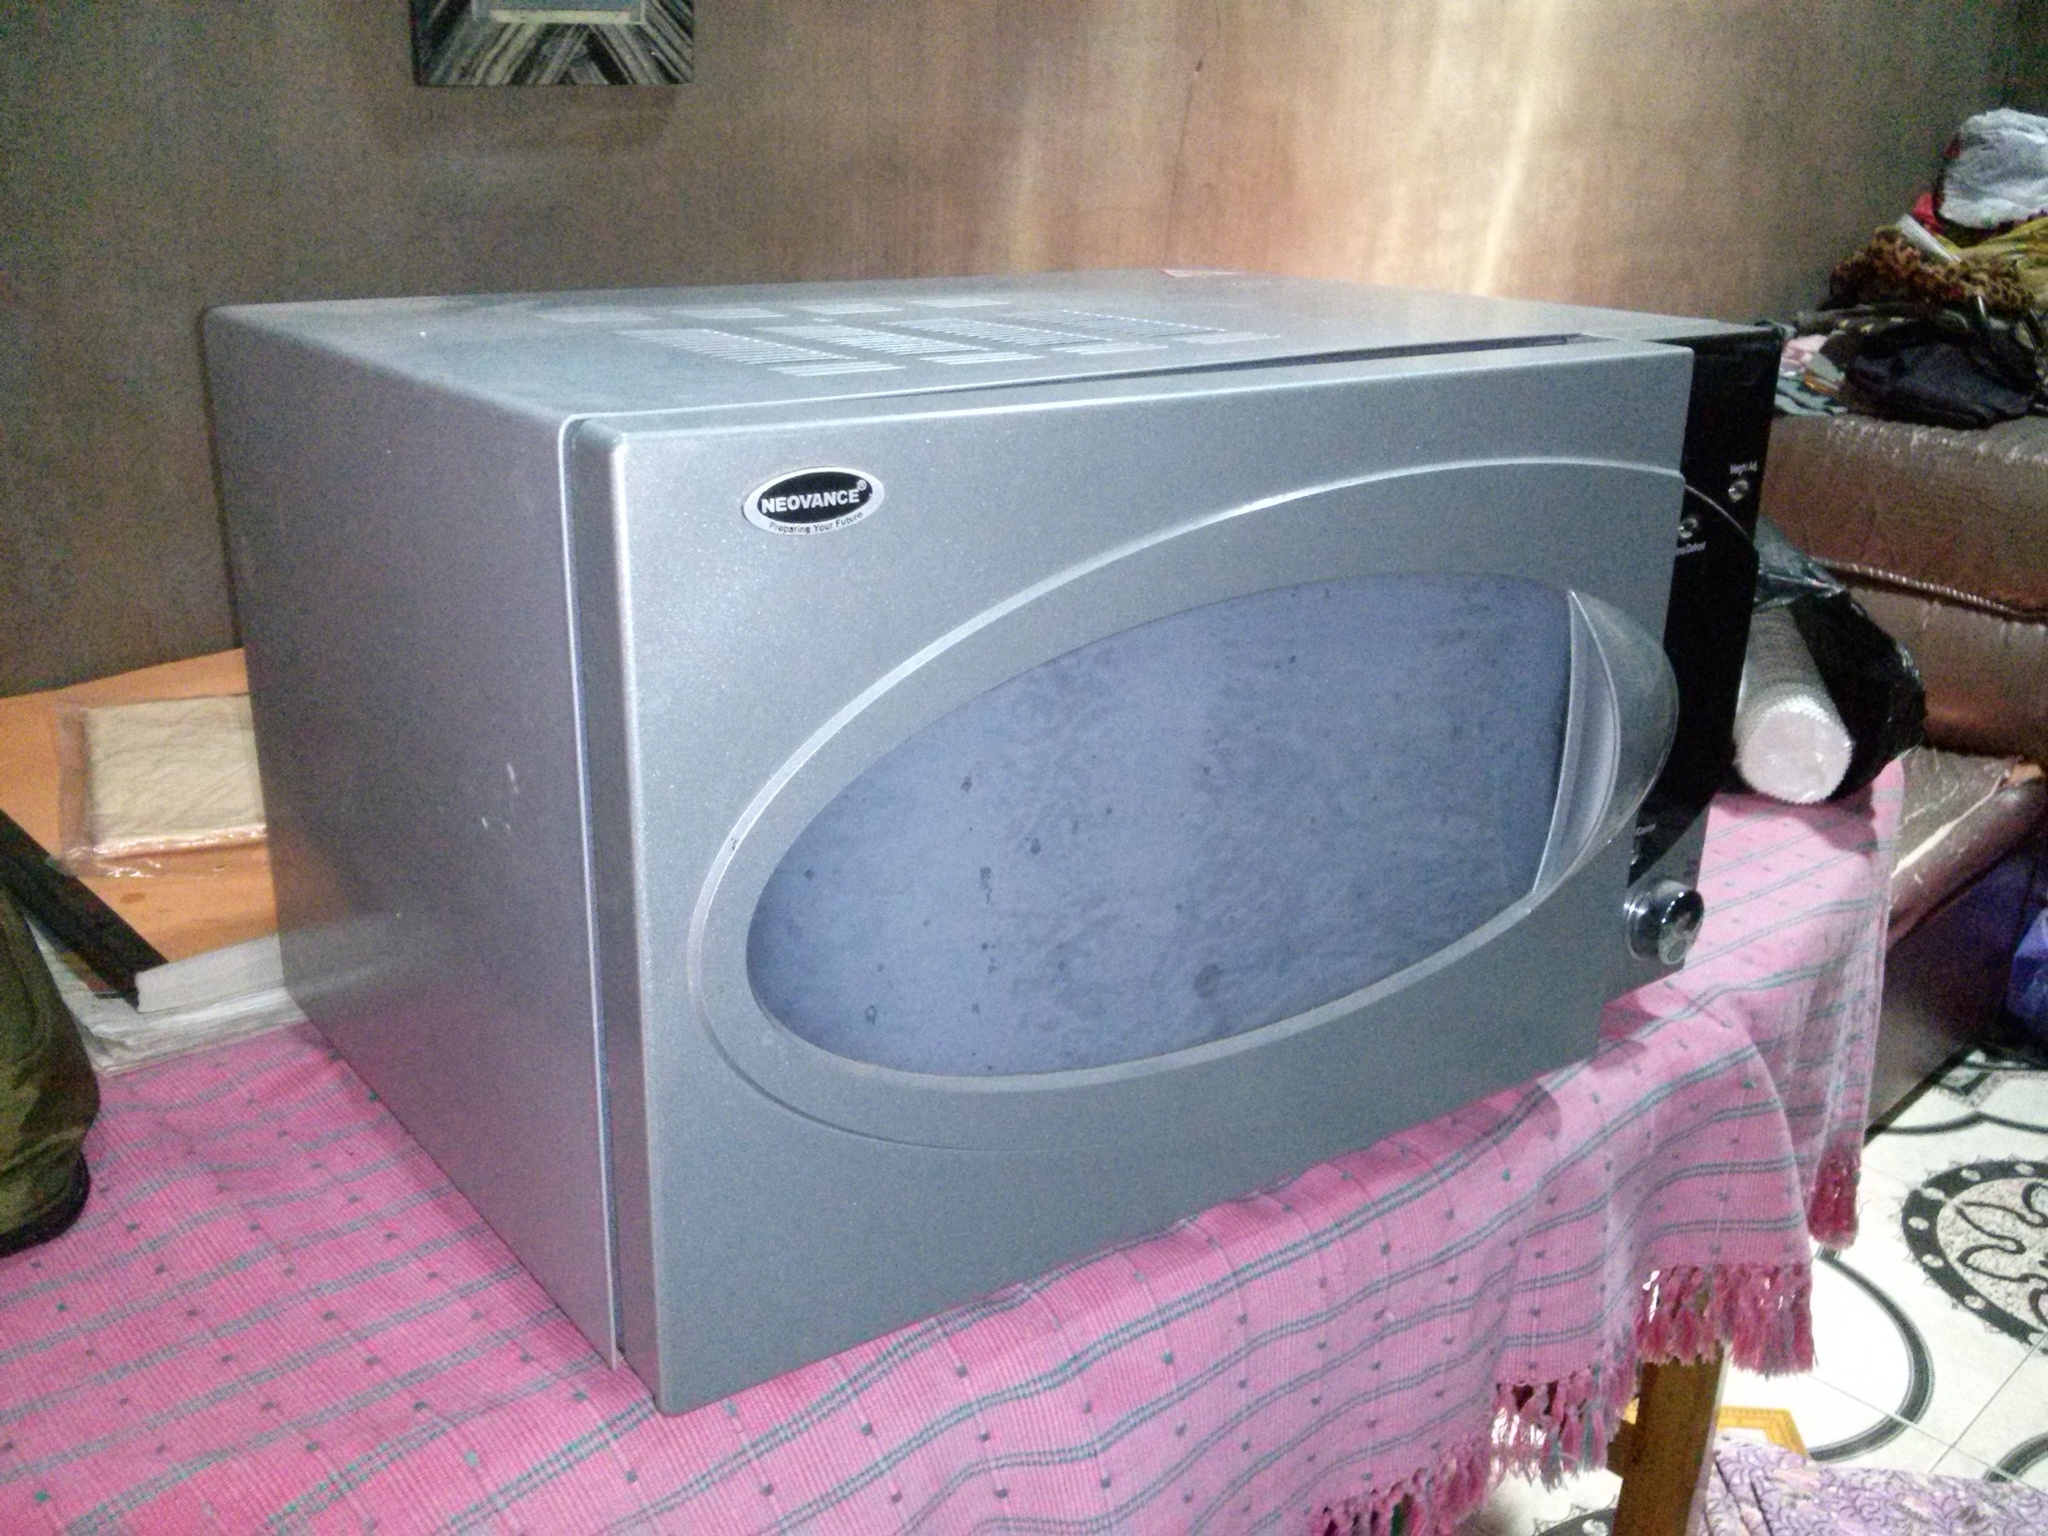 harga Microwave Neovance (Oven Listrik) Tokopedia.com